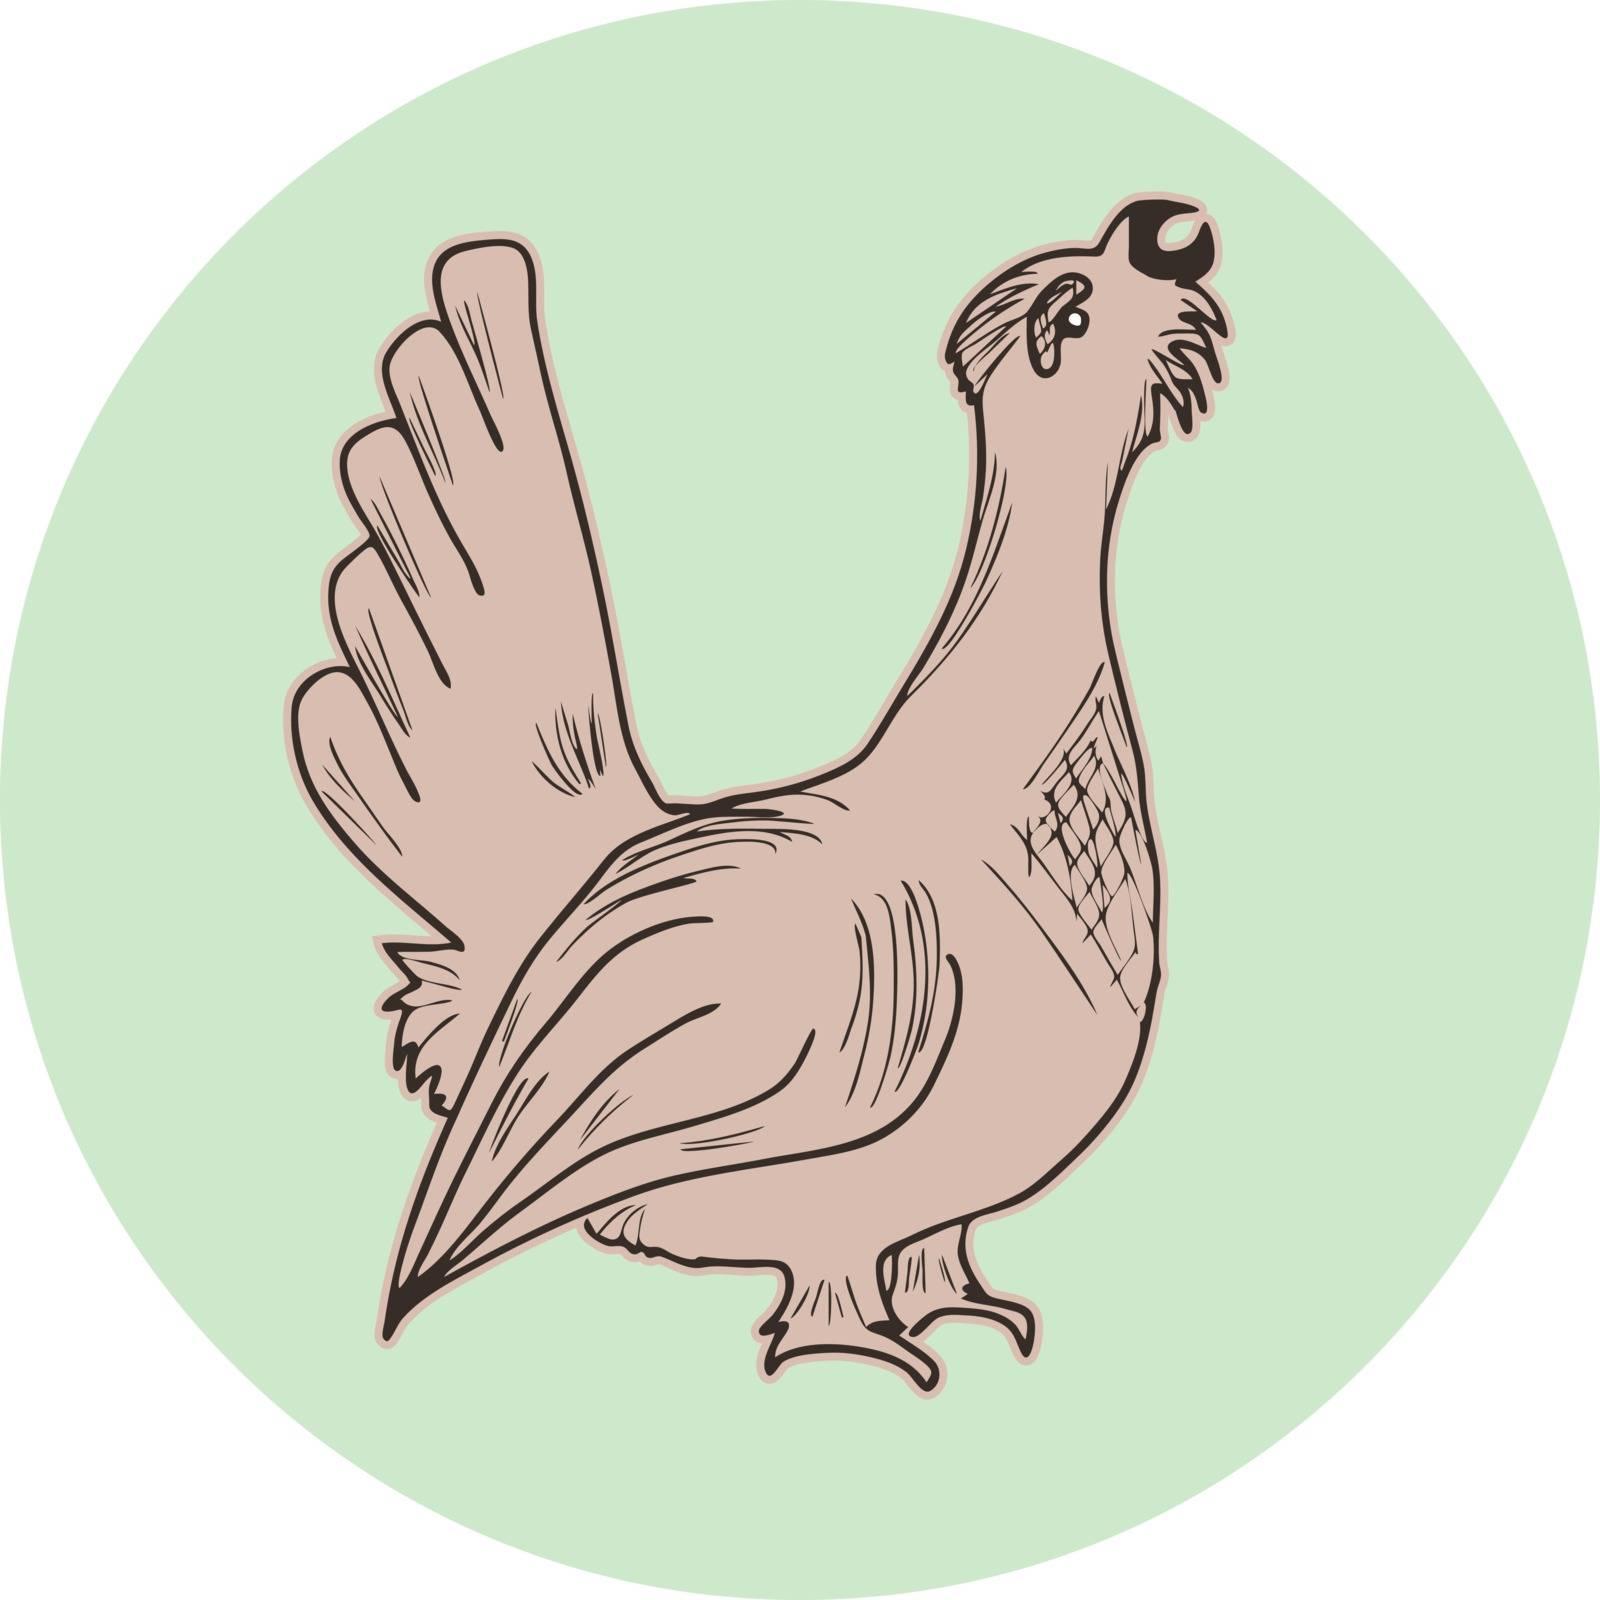 Hand drawn brown capercaillie icon, bird silhouette